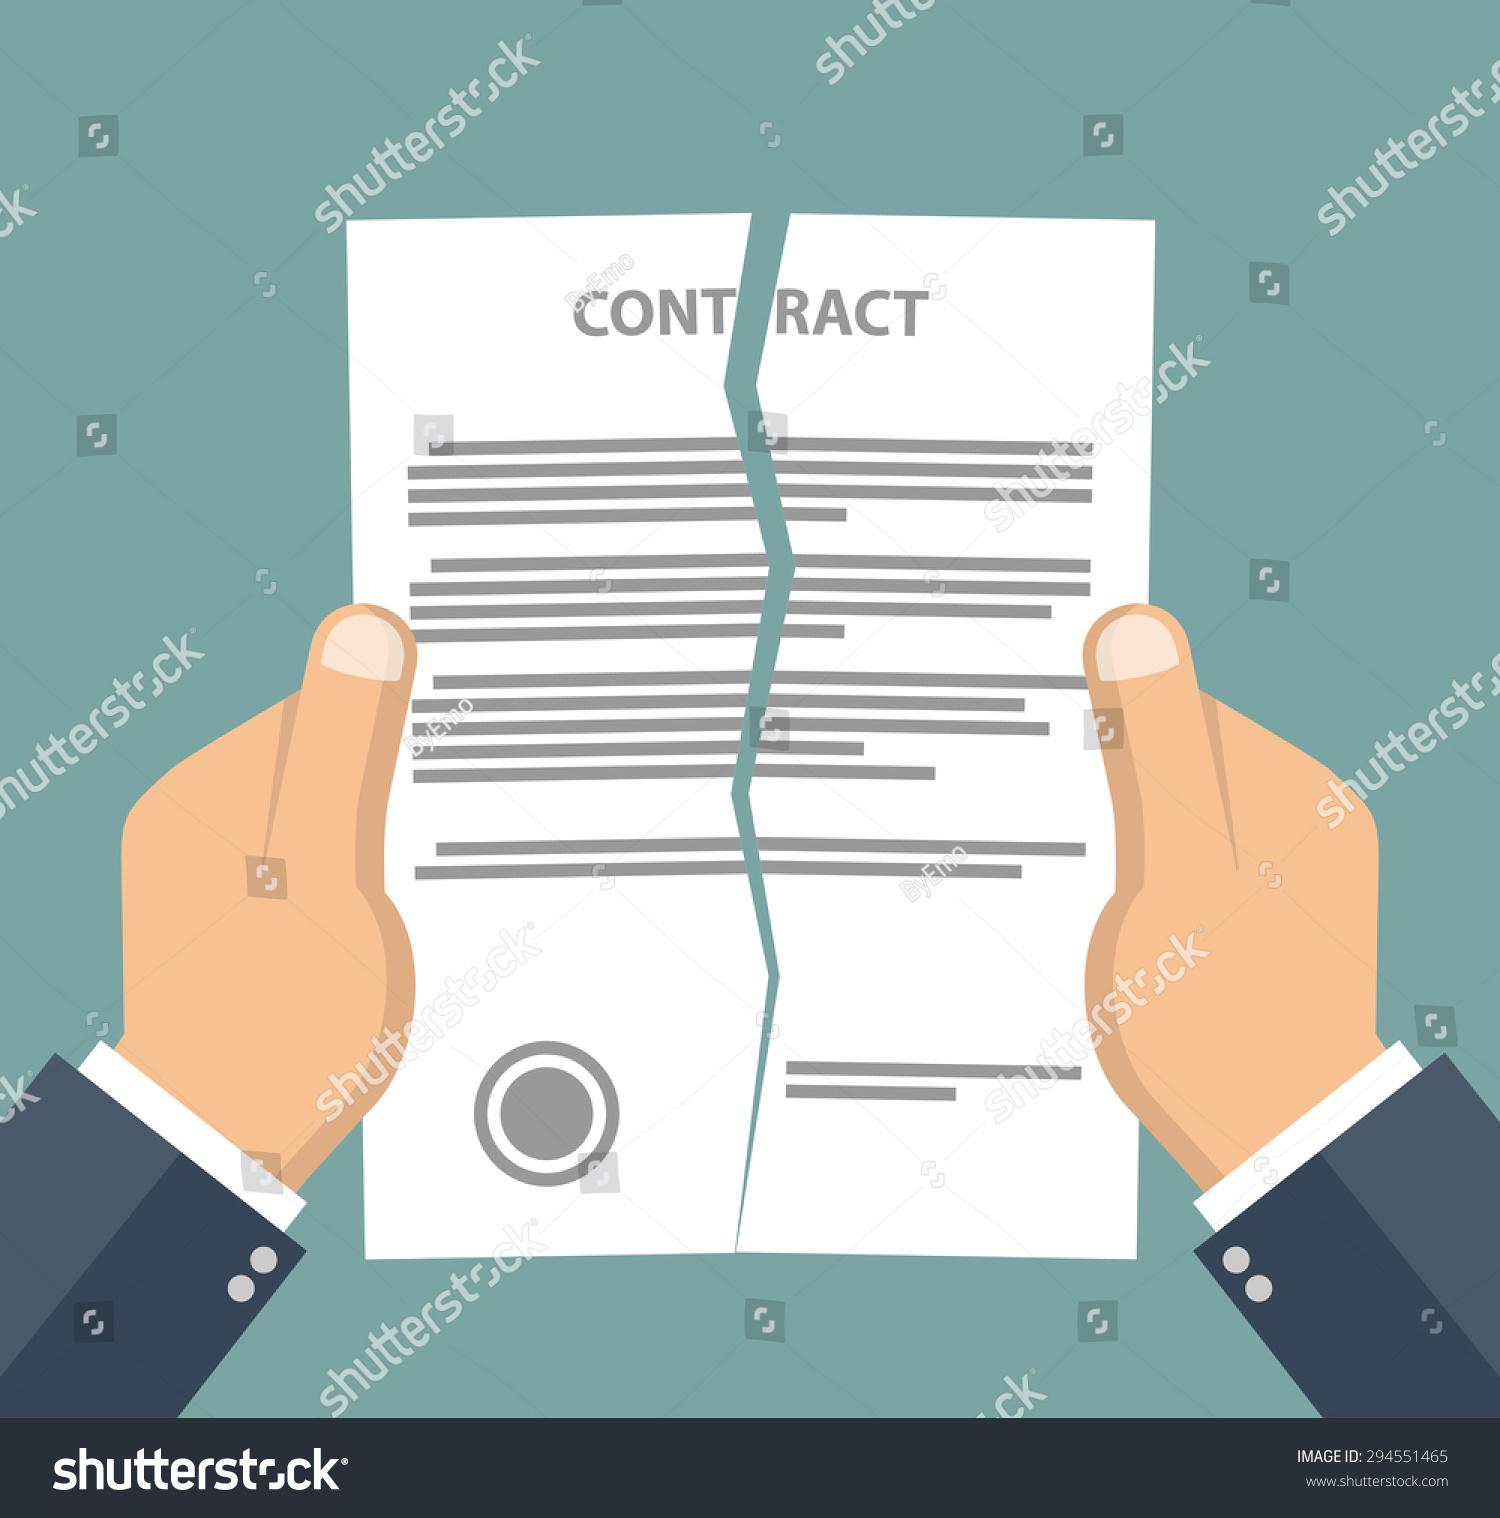 contract termination concept businessman hands tearing stock contract termination concept businessman hands tearing apart a contract flat style